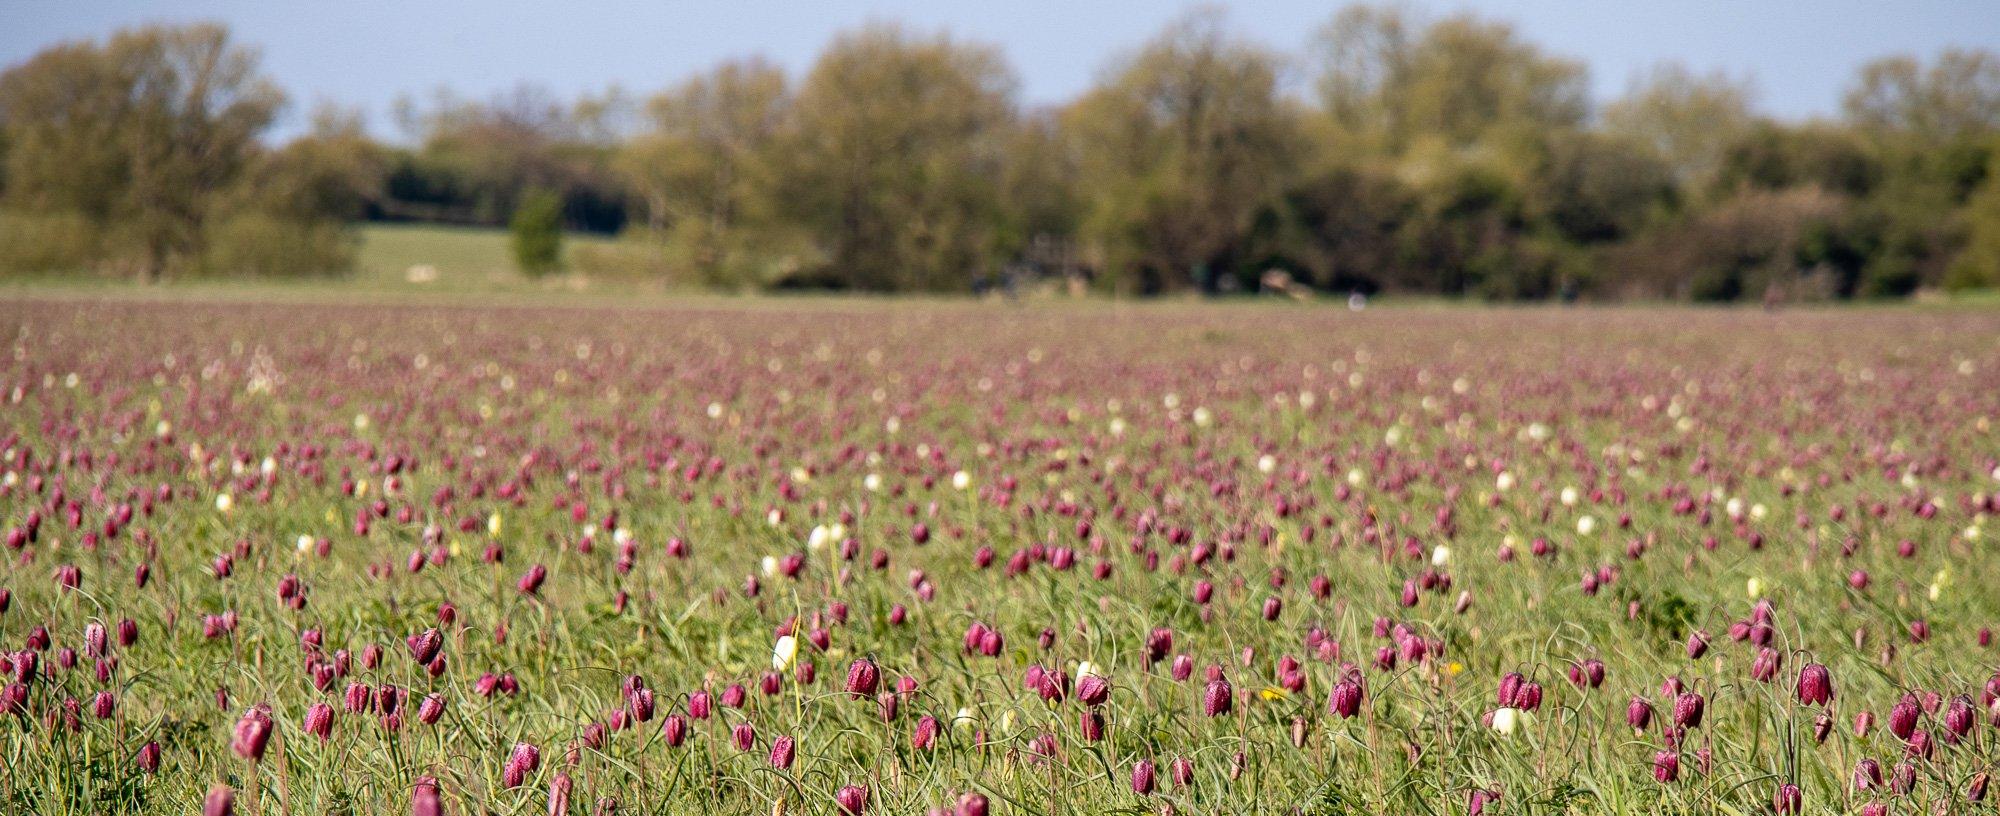 The Fritillaries are Just Past Peak Flowering